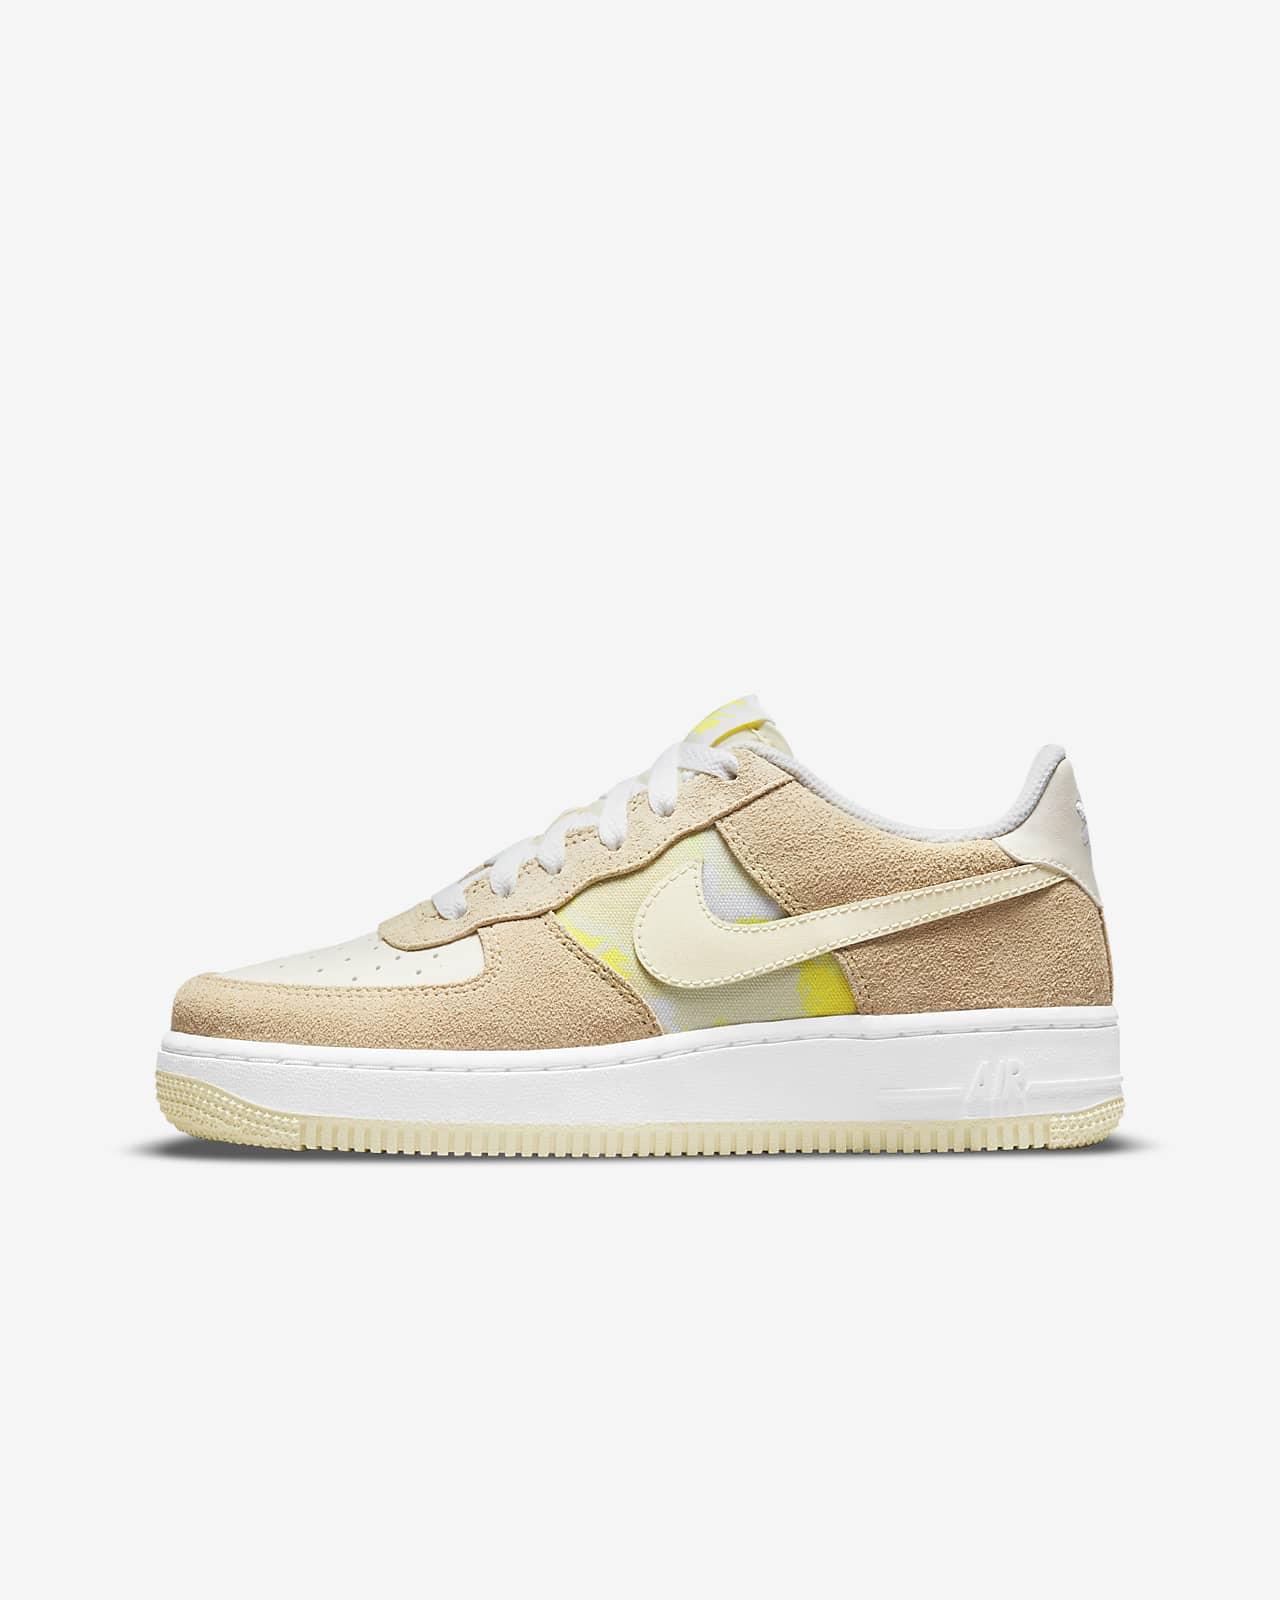 Nike Air Force 1 Low Schuh für ältere Kinder